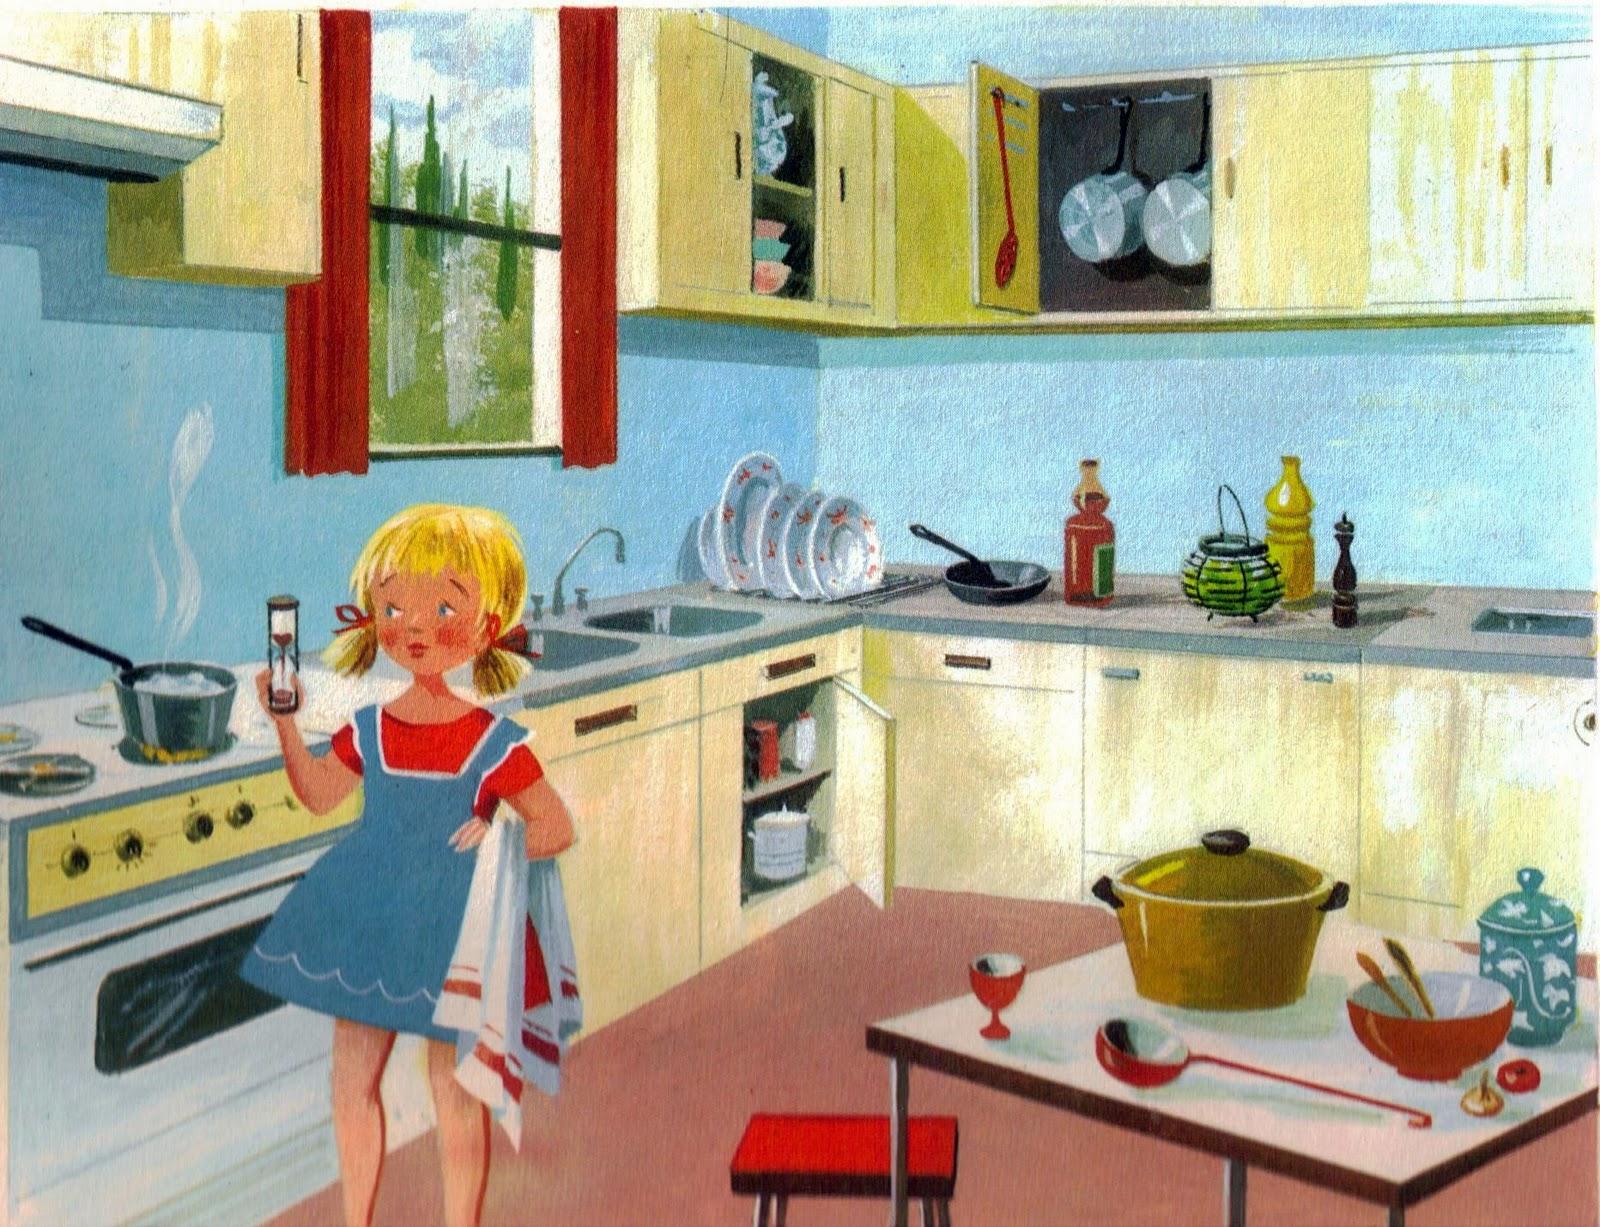 Mondorama 2000 a la cuisine fanny devant la cuisini re for Cuisine 2000